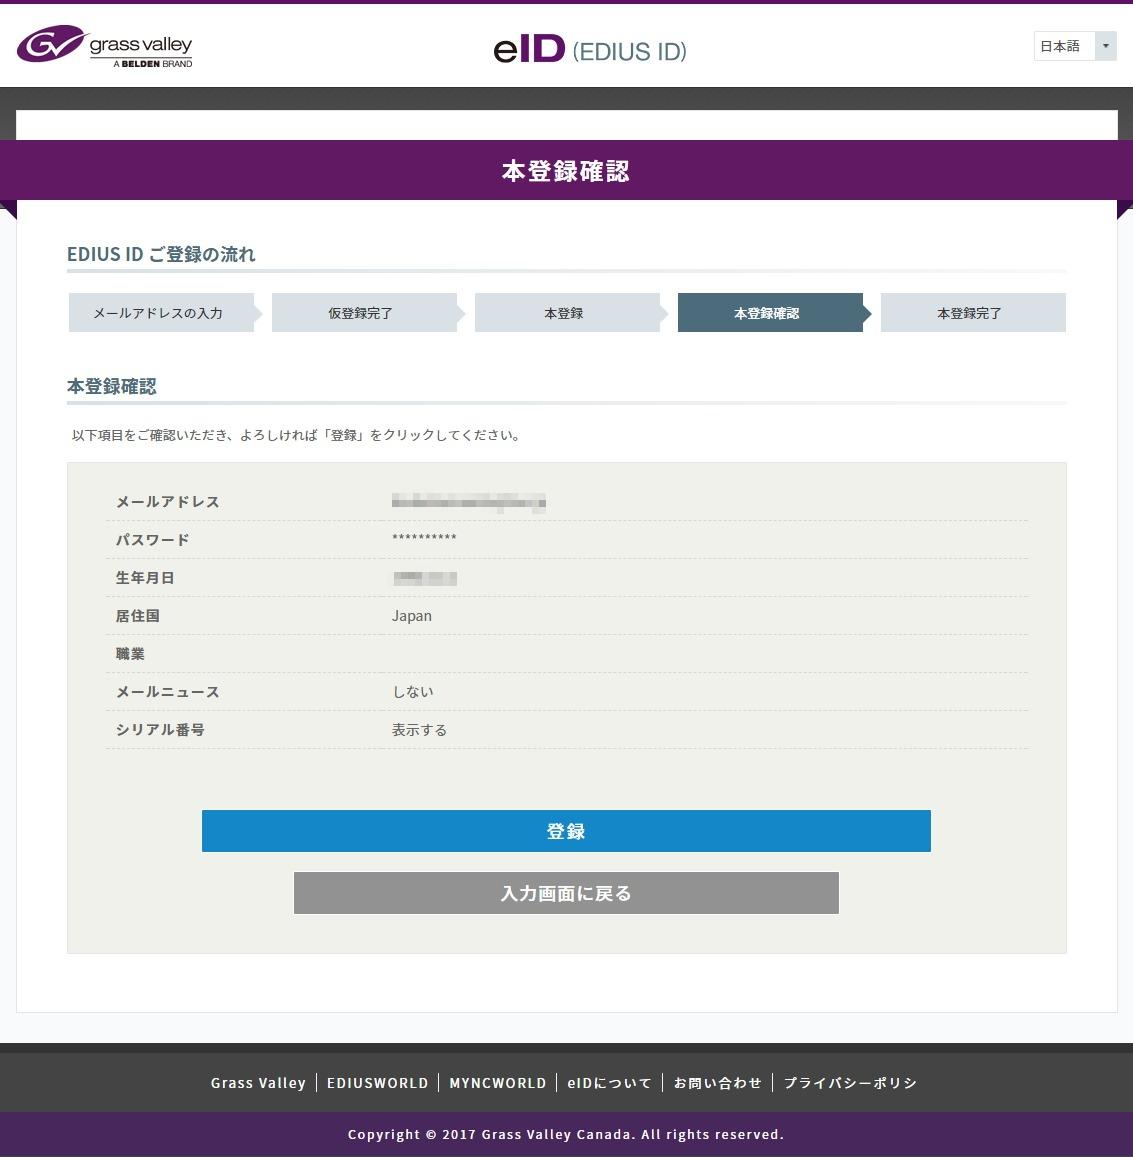 EDIUS Pro 9 体験版 インストール~起動まで